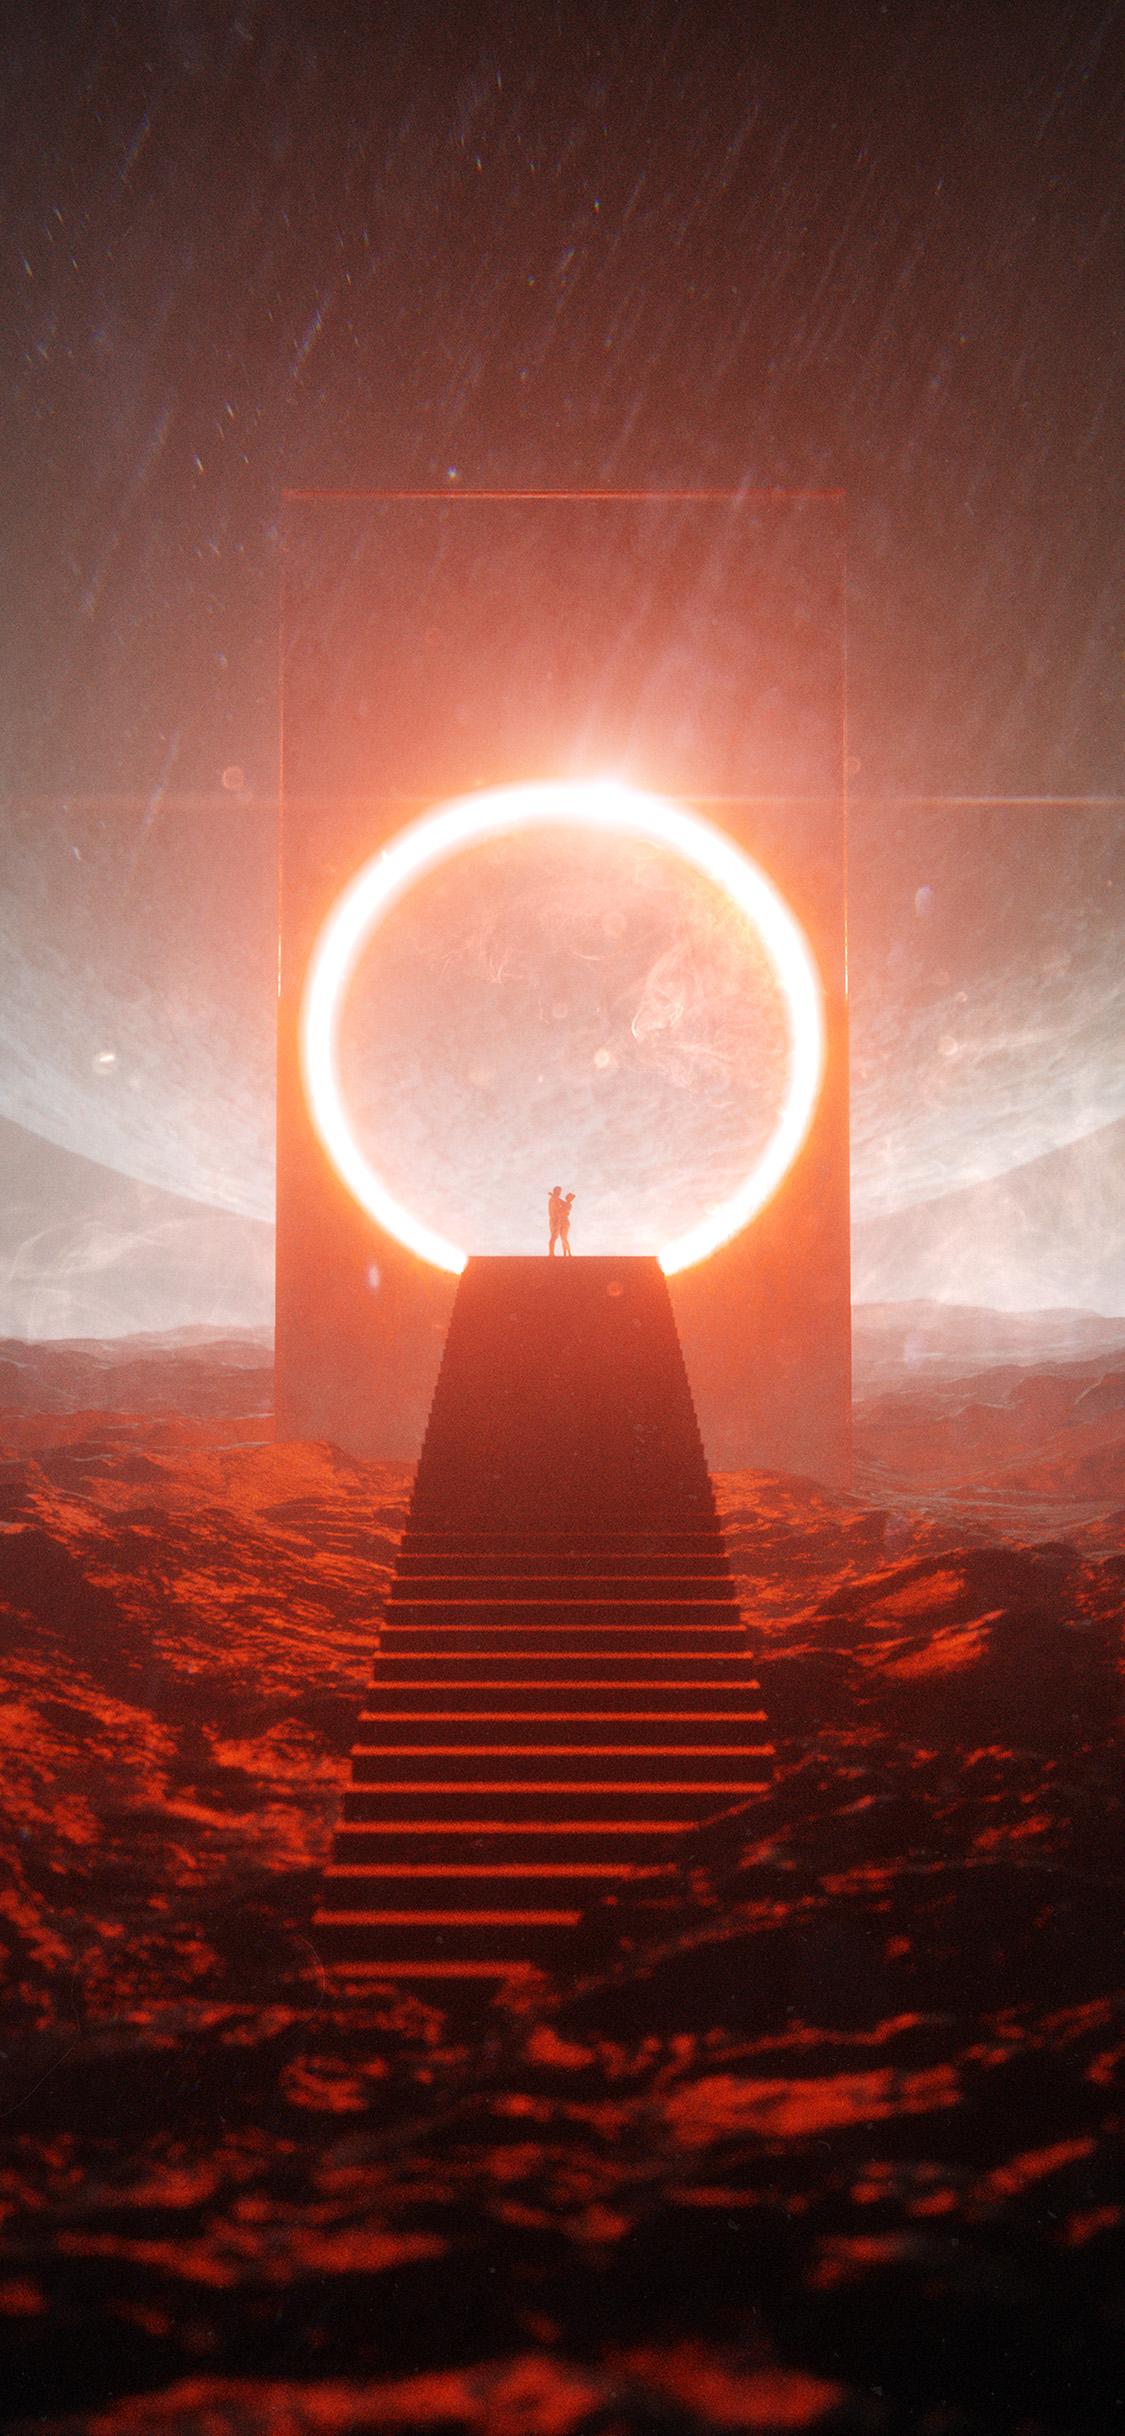 Be02 Stuart Space Digital Fantasy Art Illustration Wallpaper